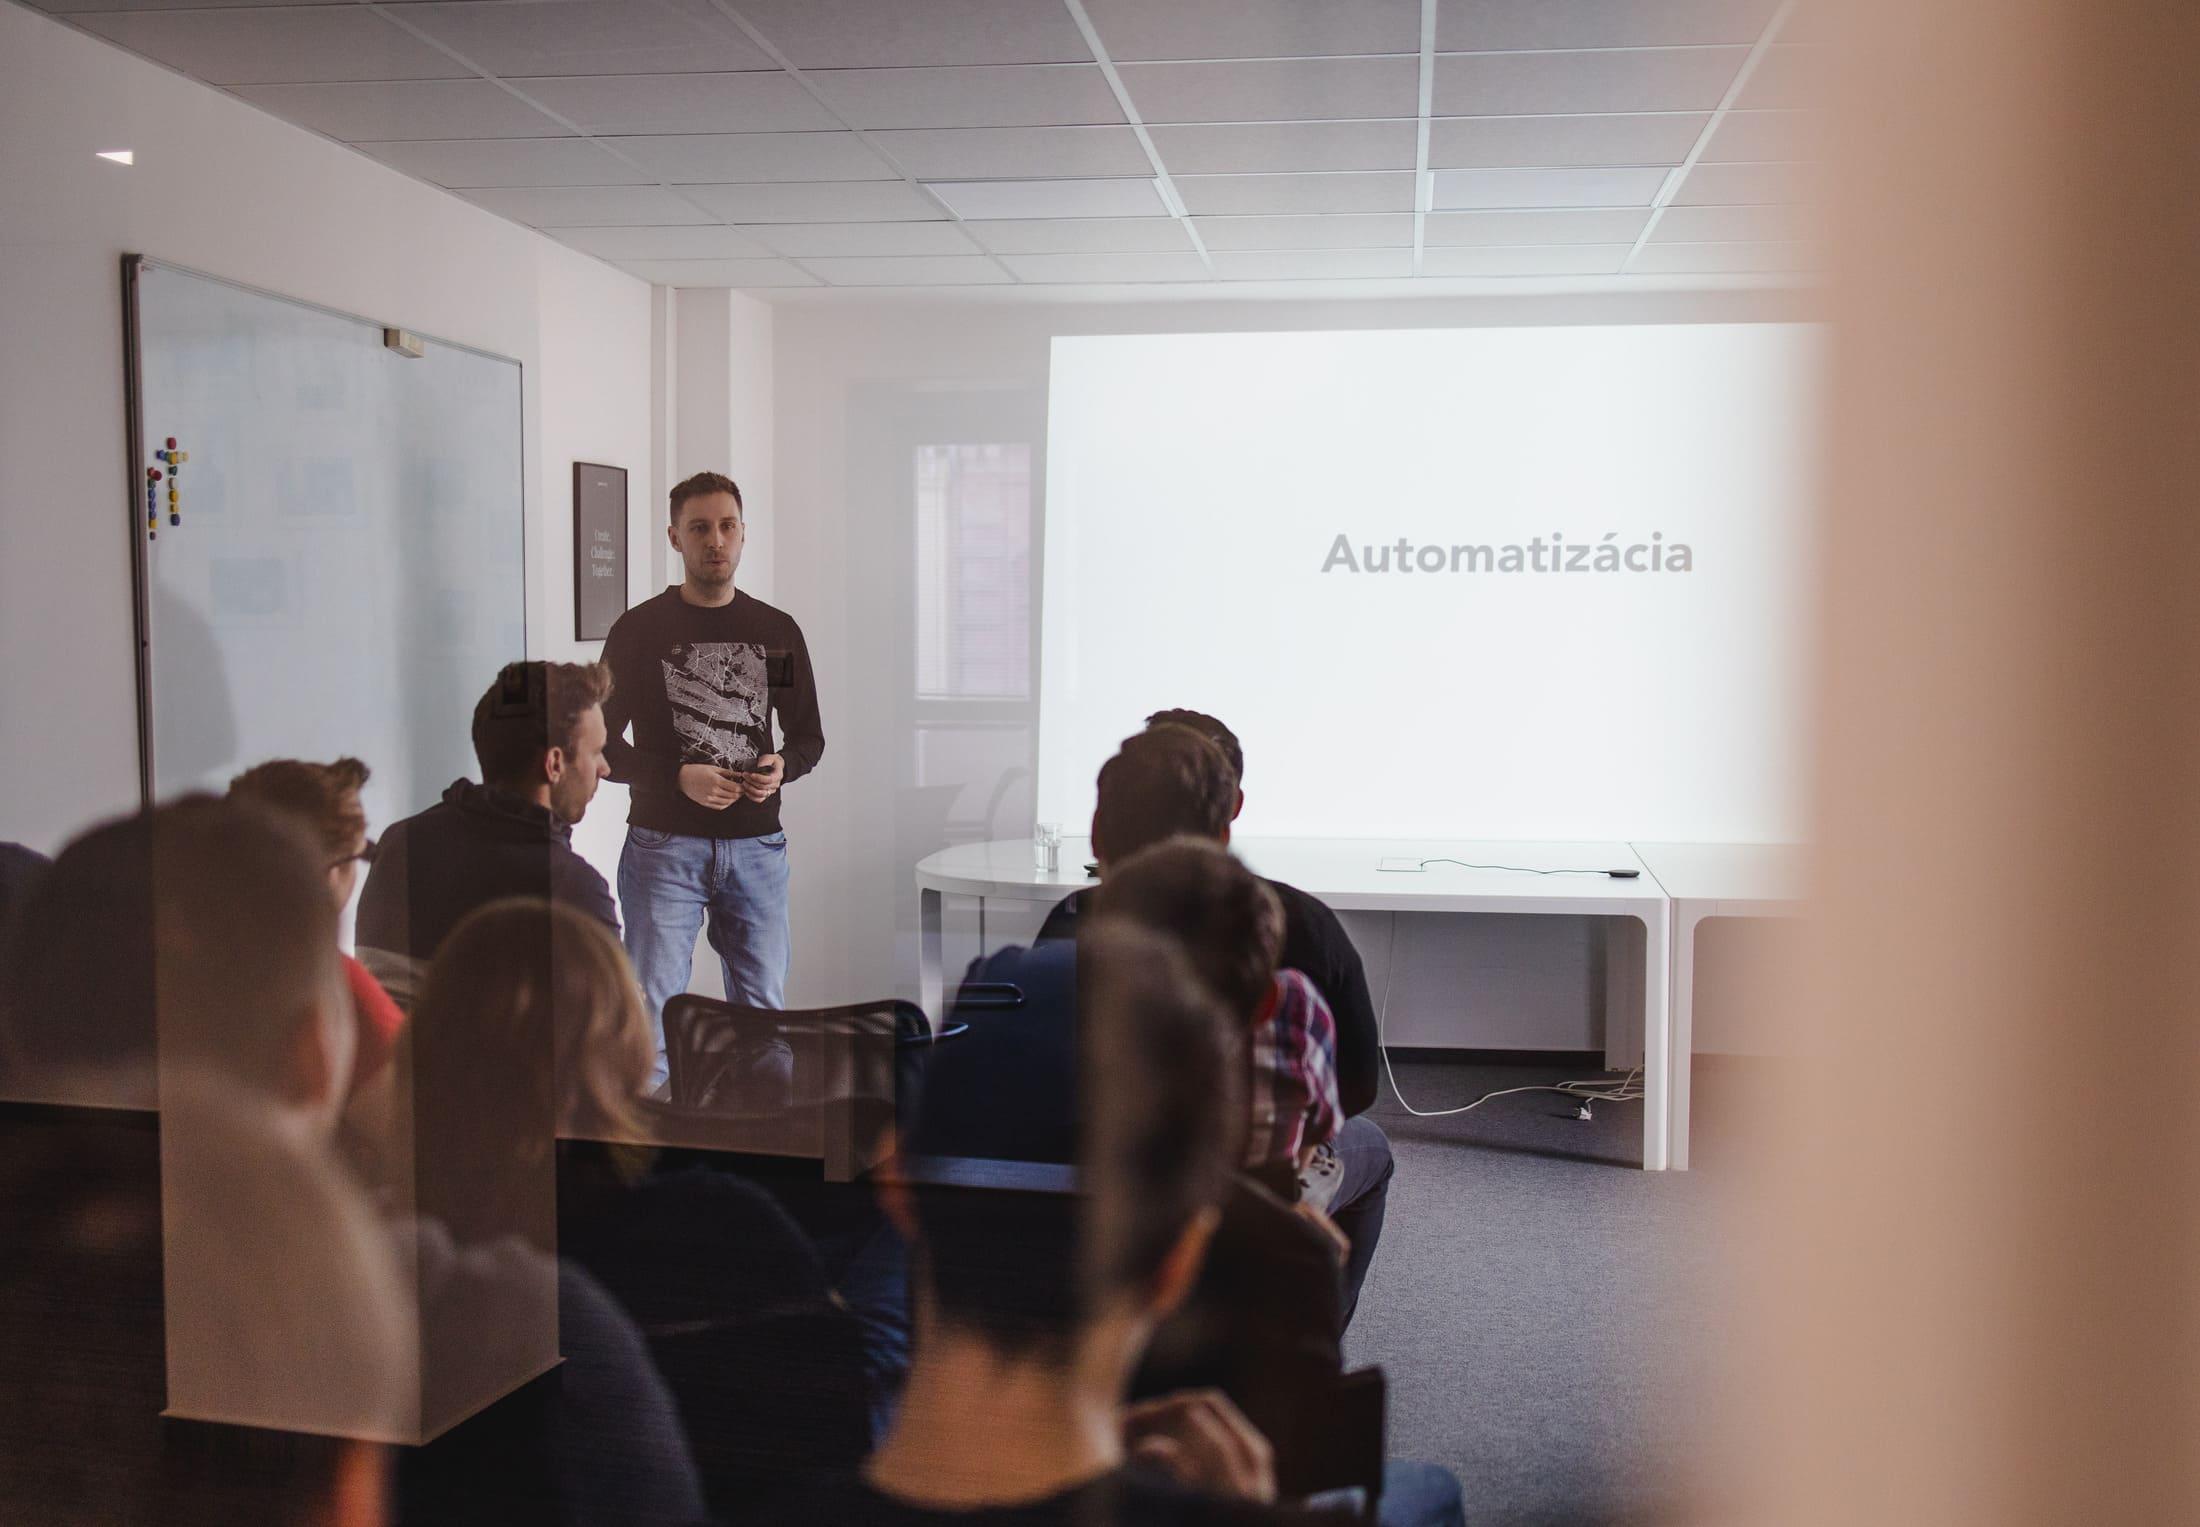 HACKATHON 2020 (how to organize internal hackathon)